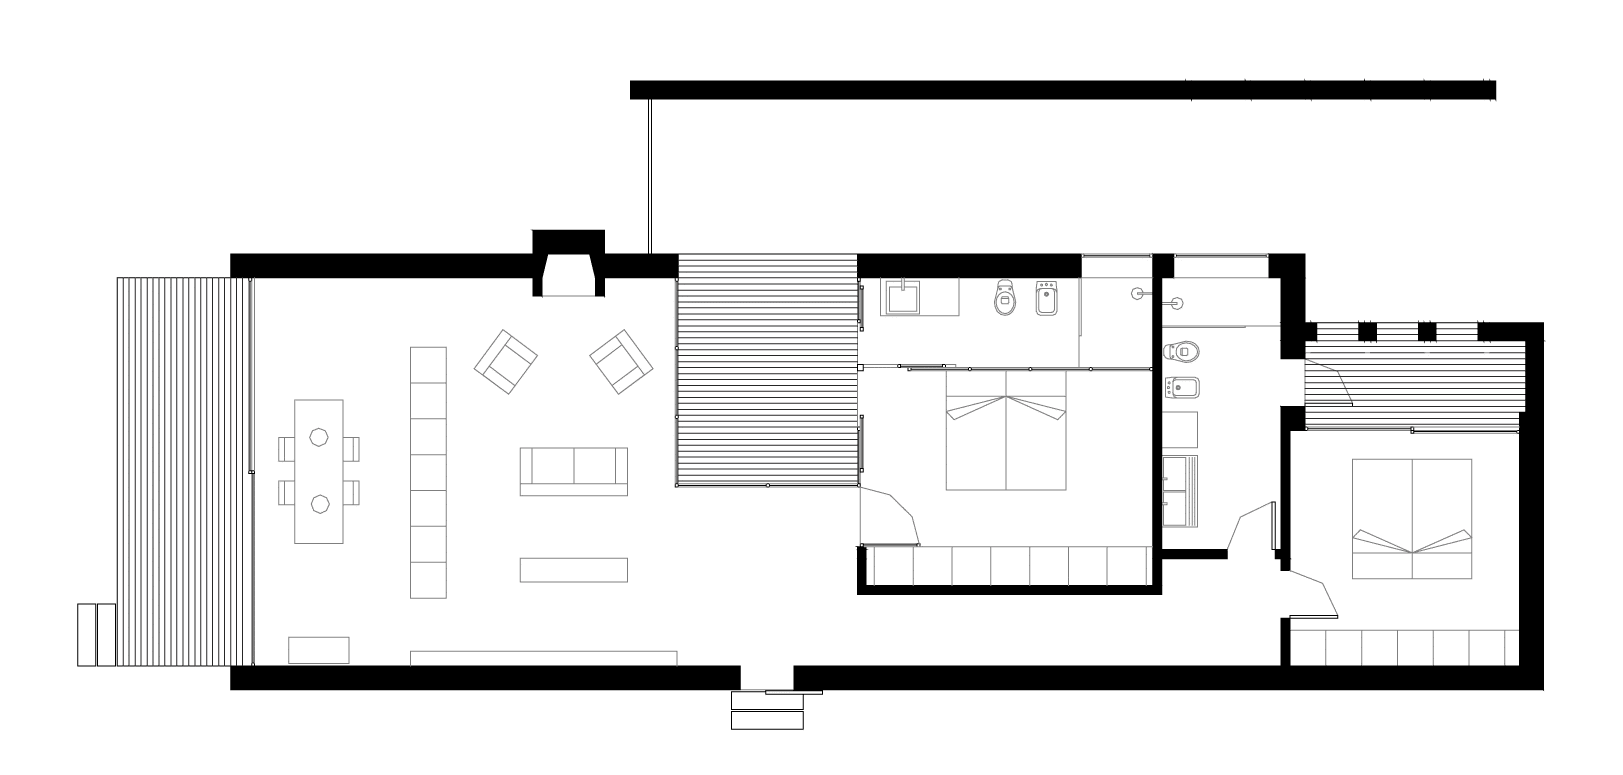 Planos de casa peque a de un piso con cerco perim trico for Planos para construccion casas pequenas